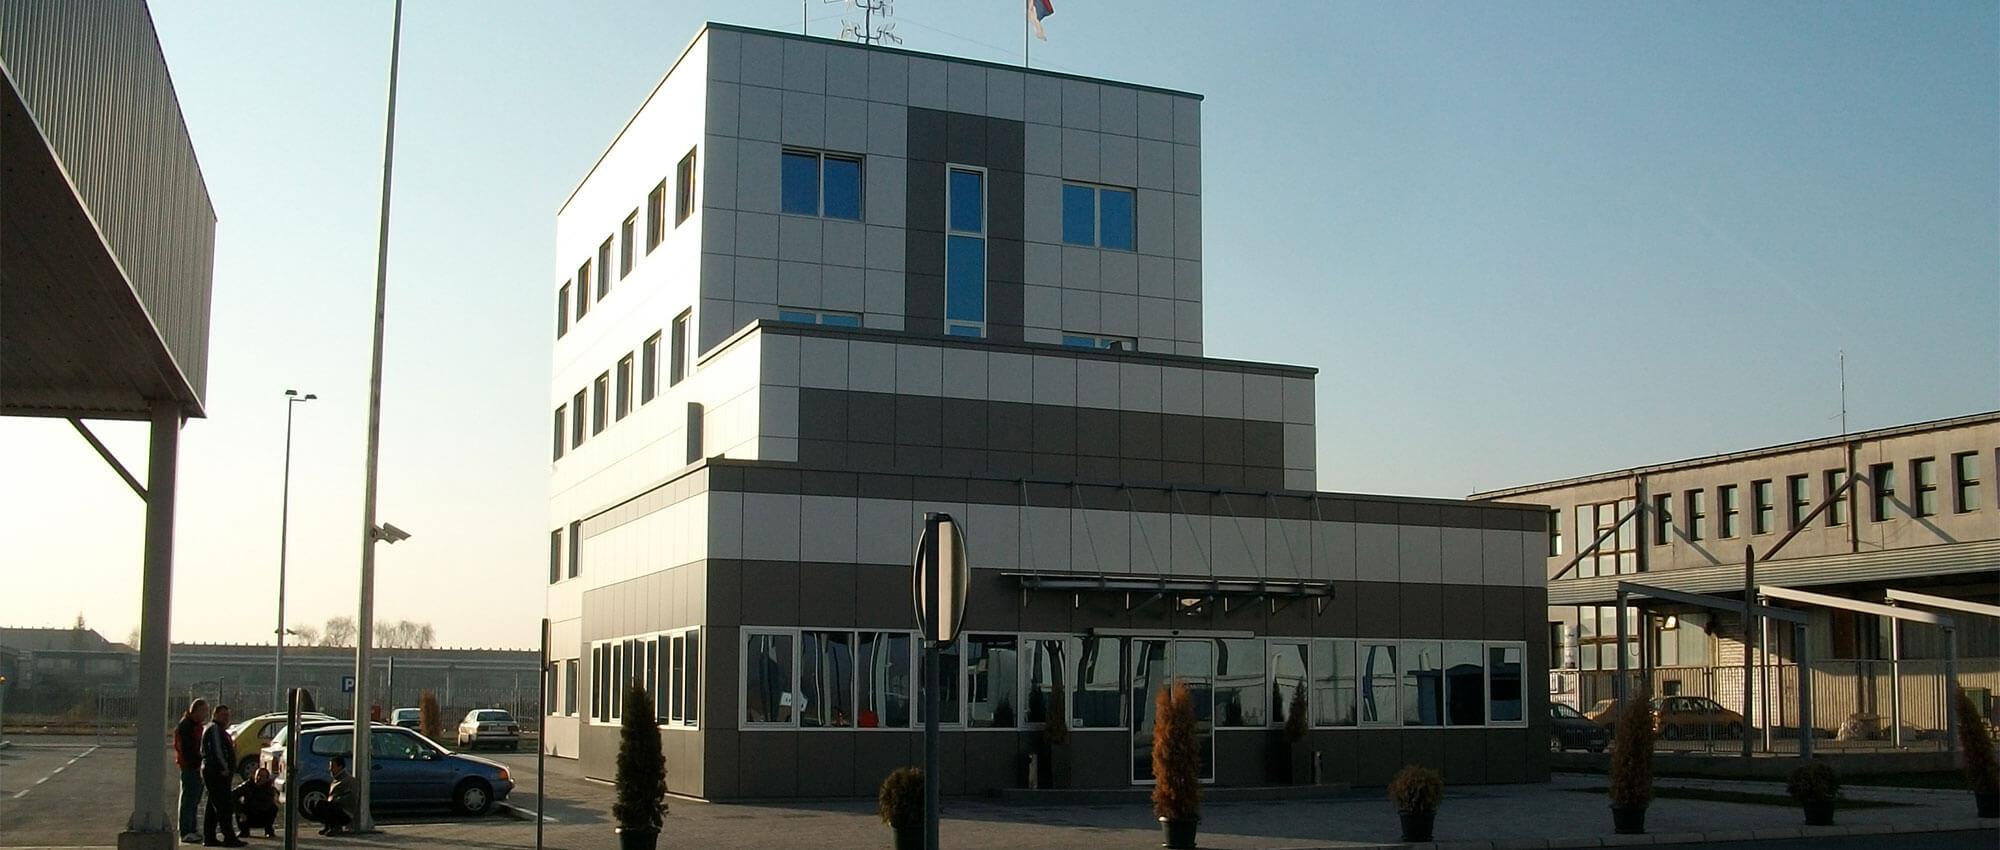 Robnocarinski terminal carinske ispostave, Kruševac